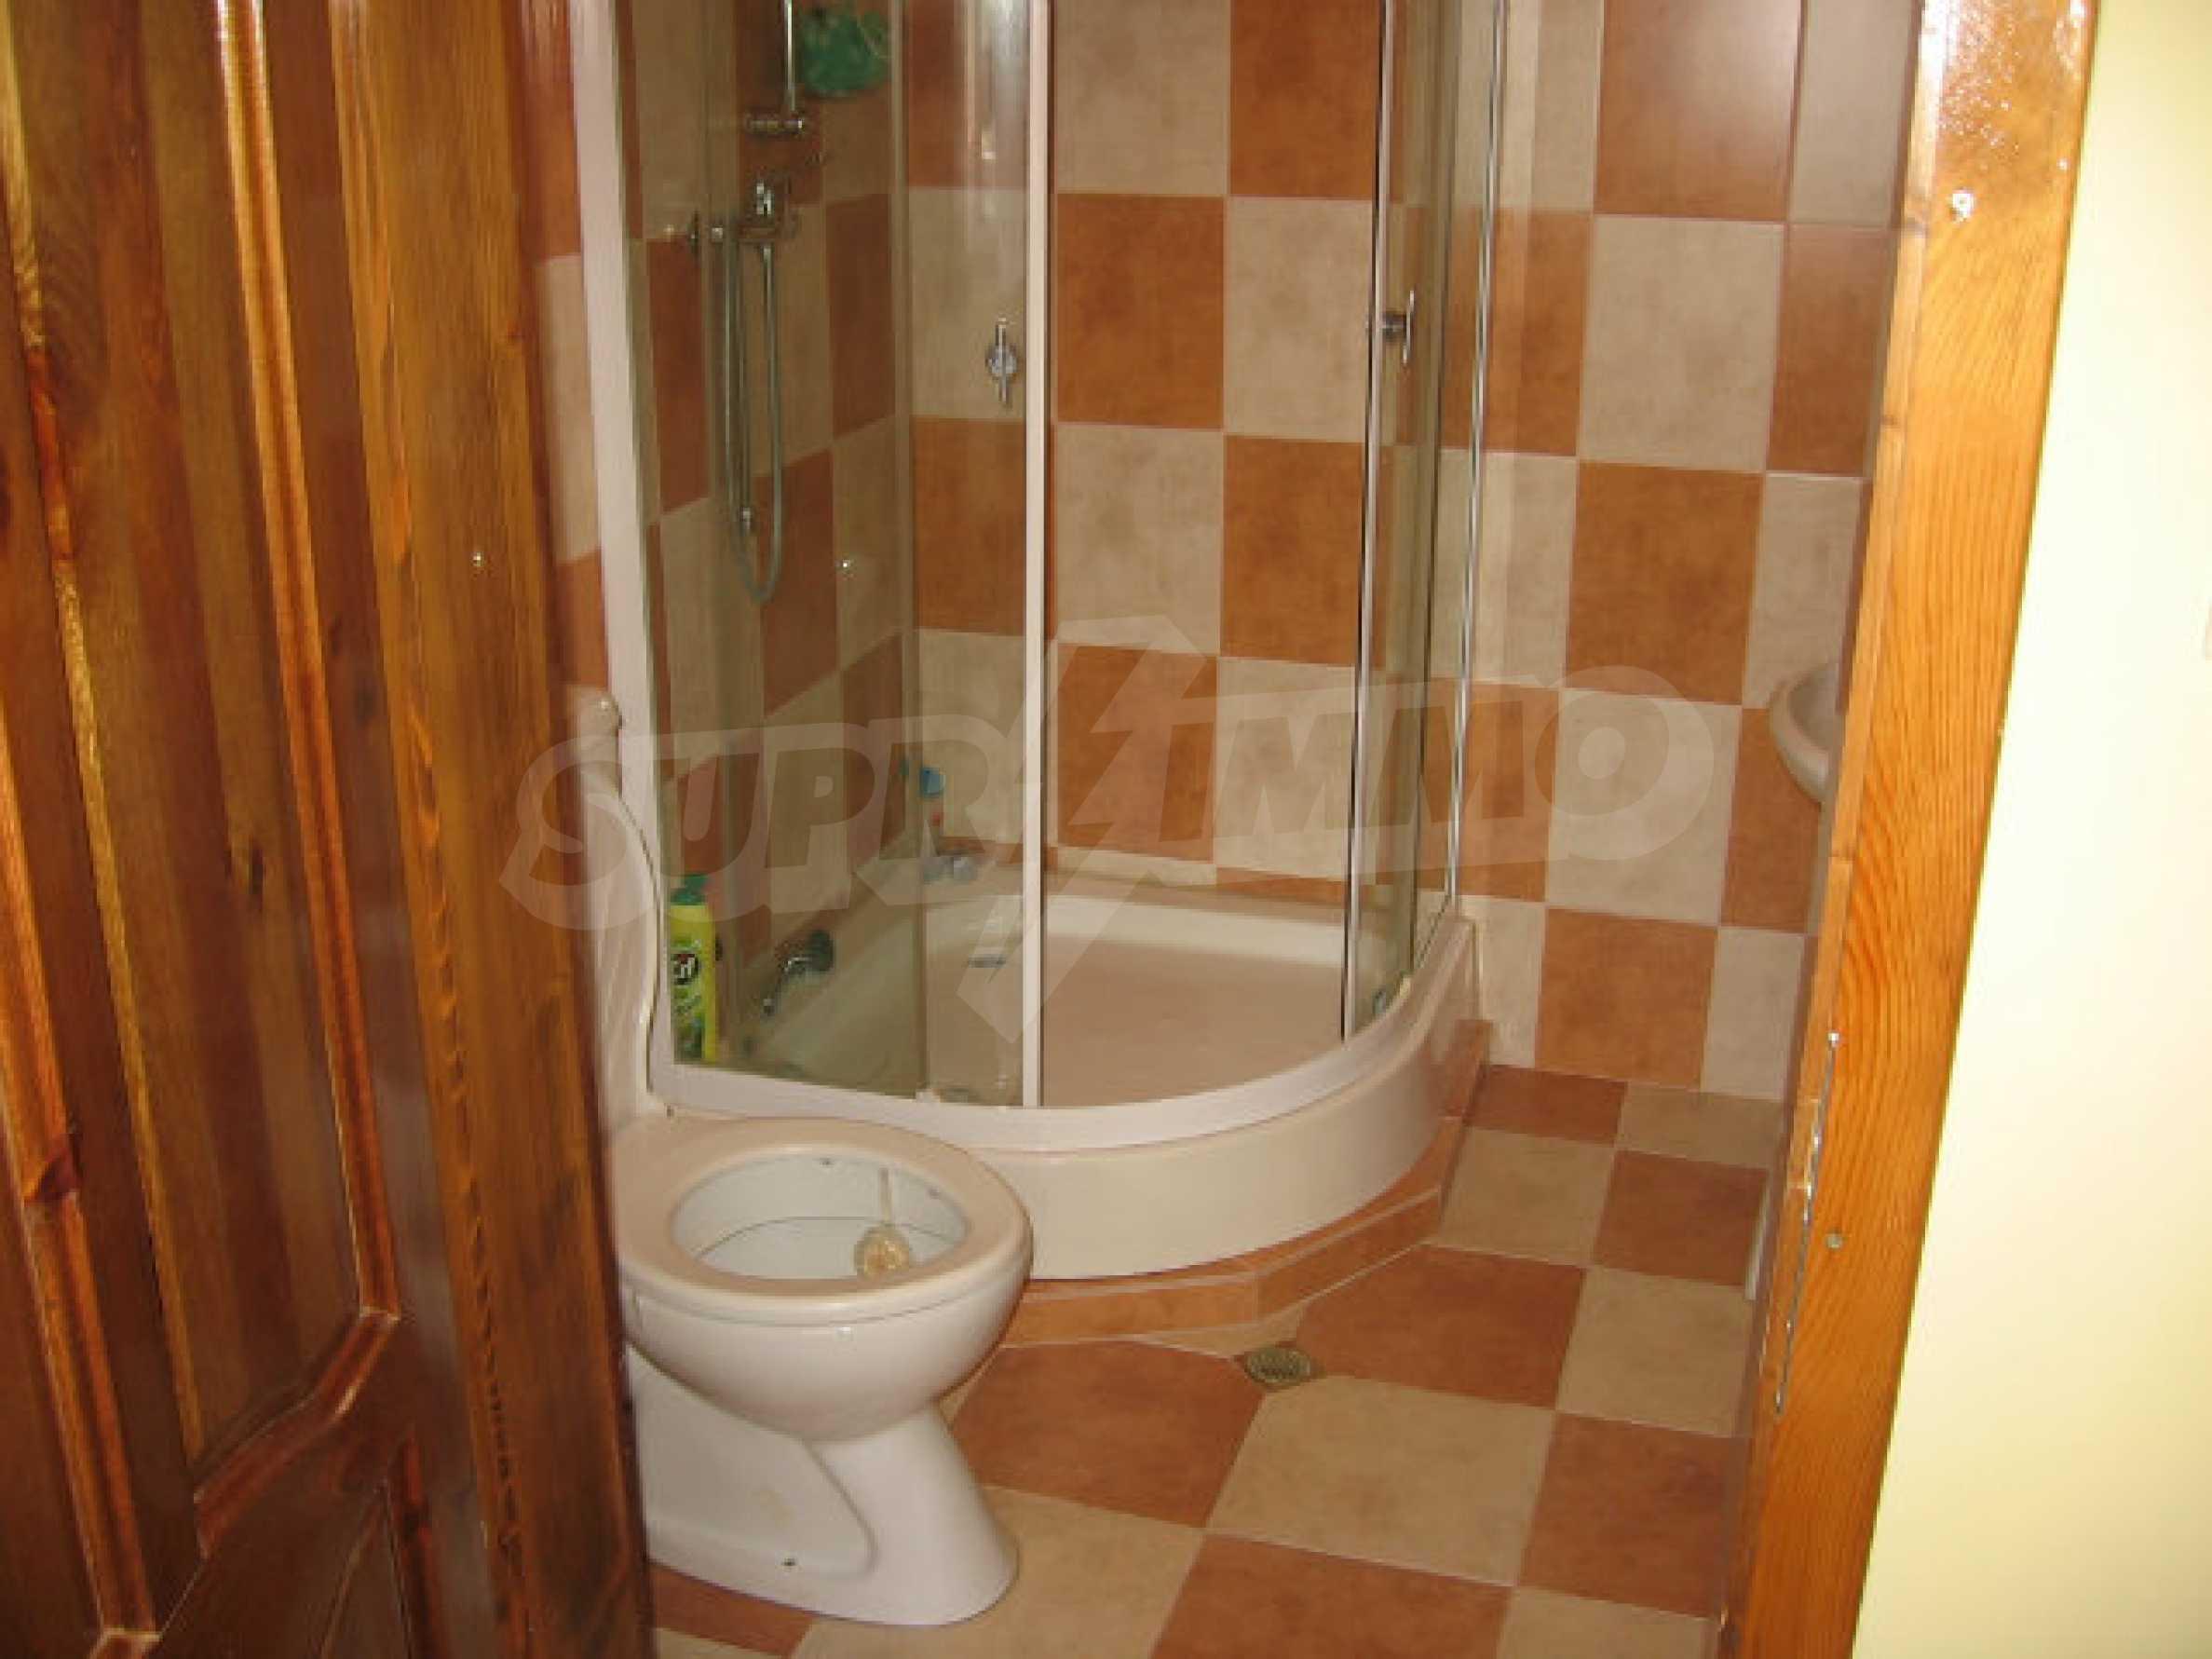 Restored and furnished three-storey house in a quiet village near Smolyan 30